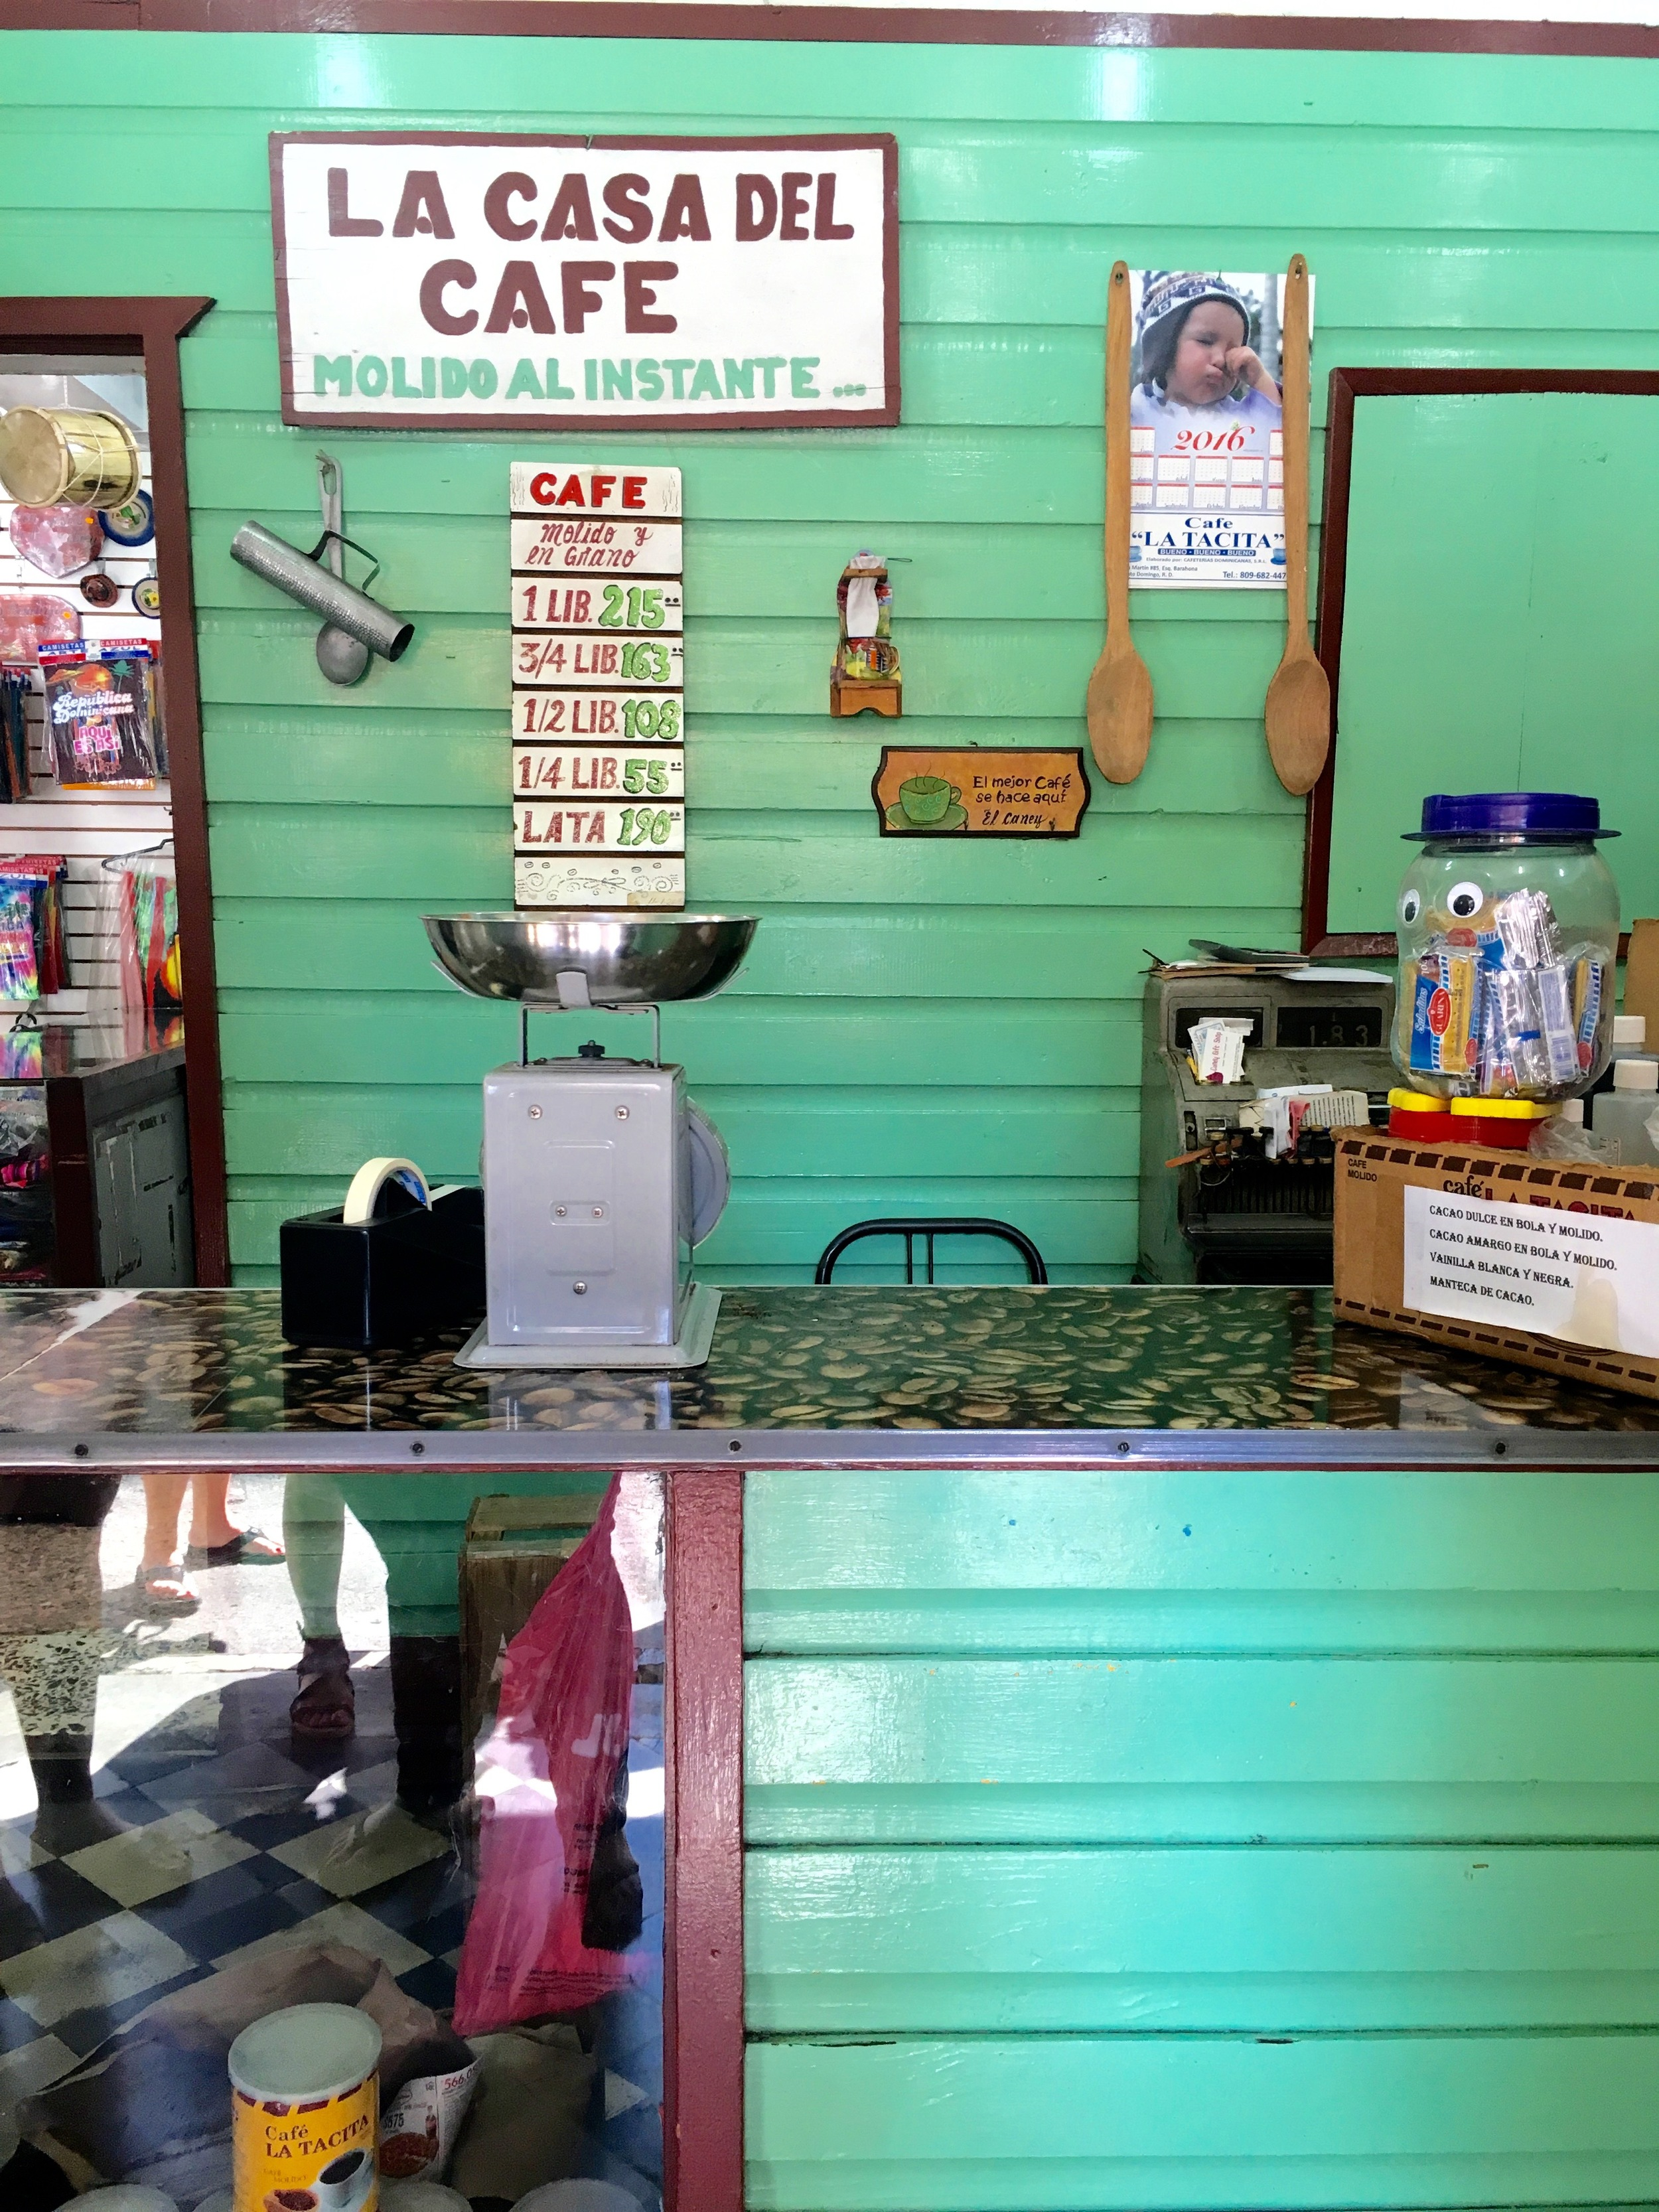 La Casa Del Cafe